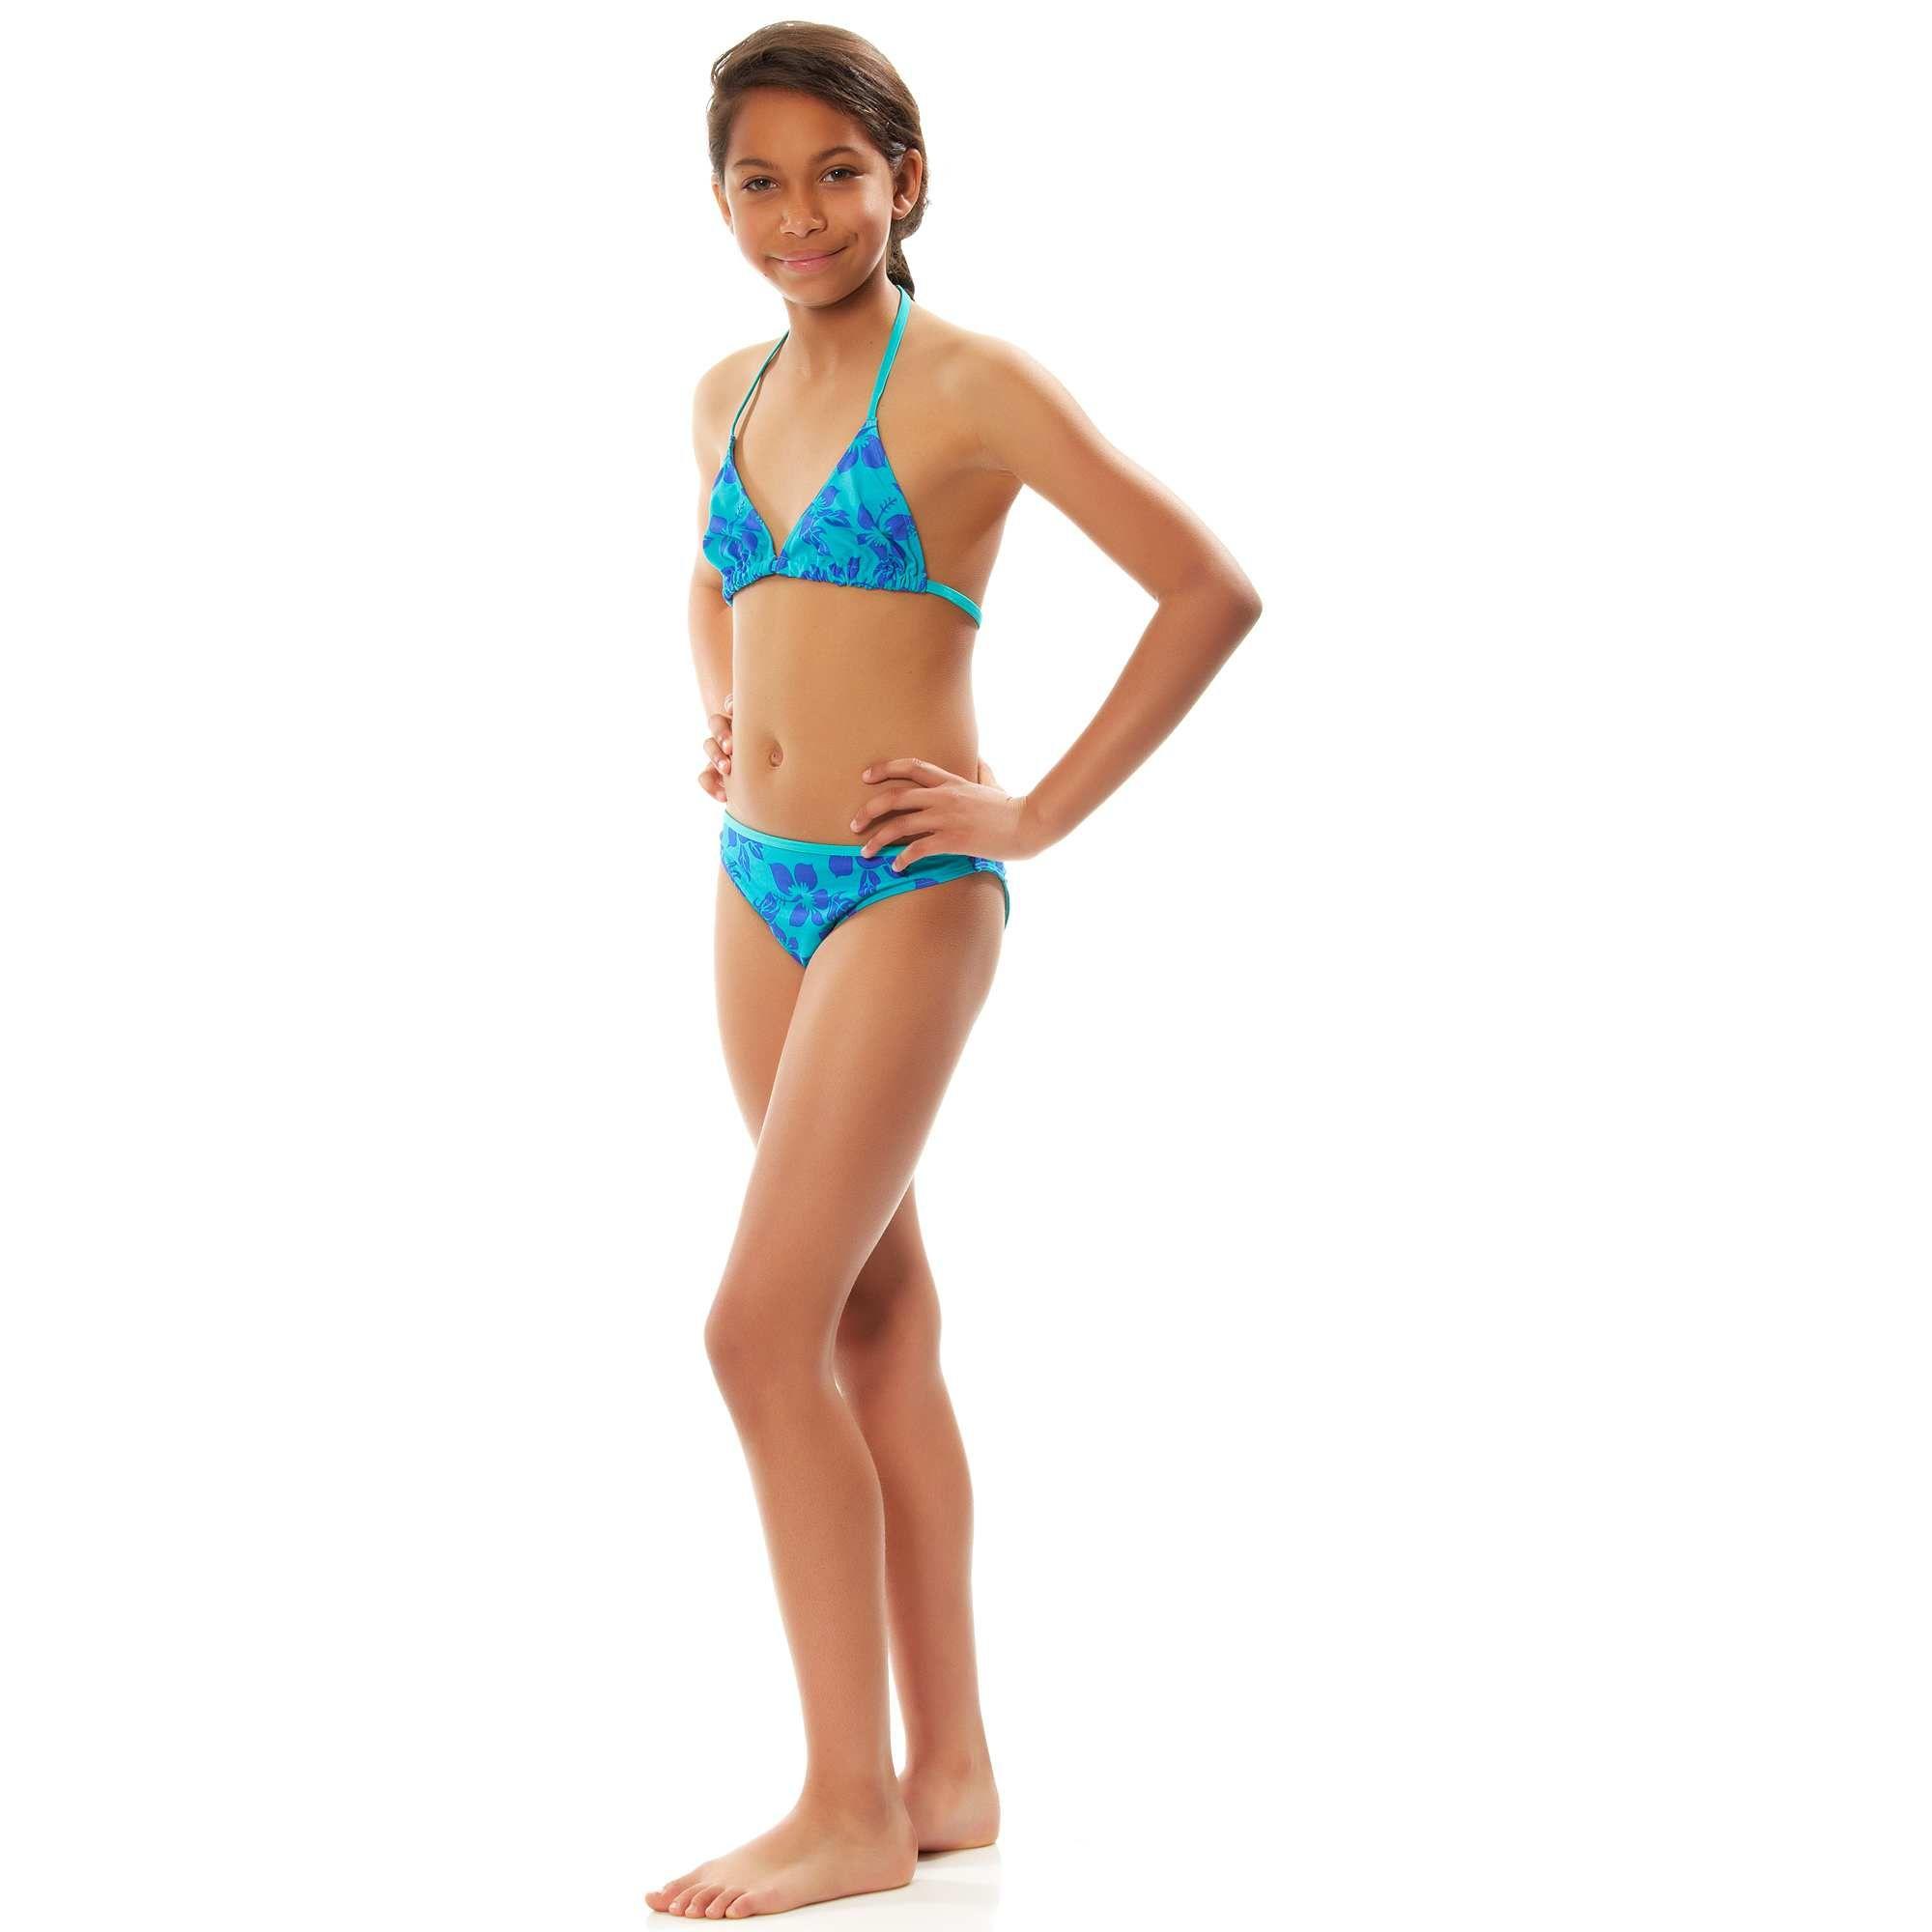 witherspoon-naked-dancing-teens-bikini-made-interracial-sex